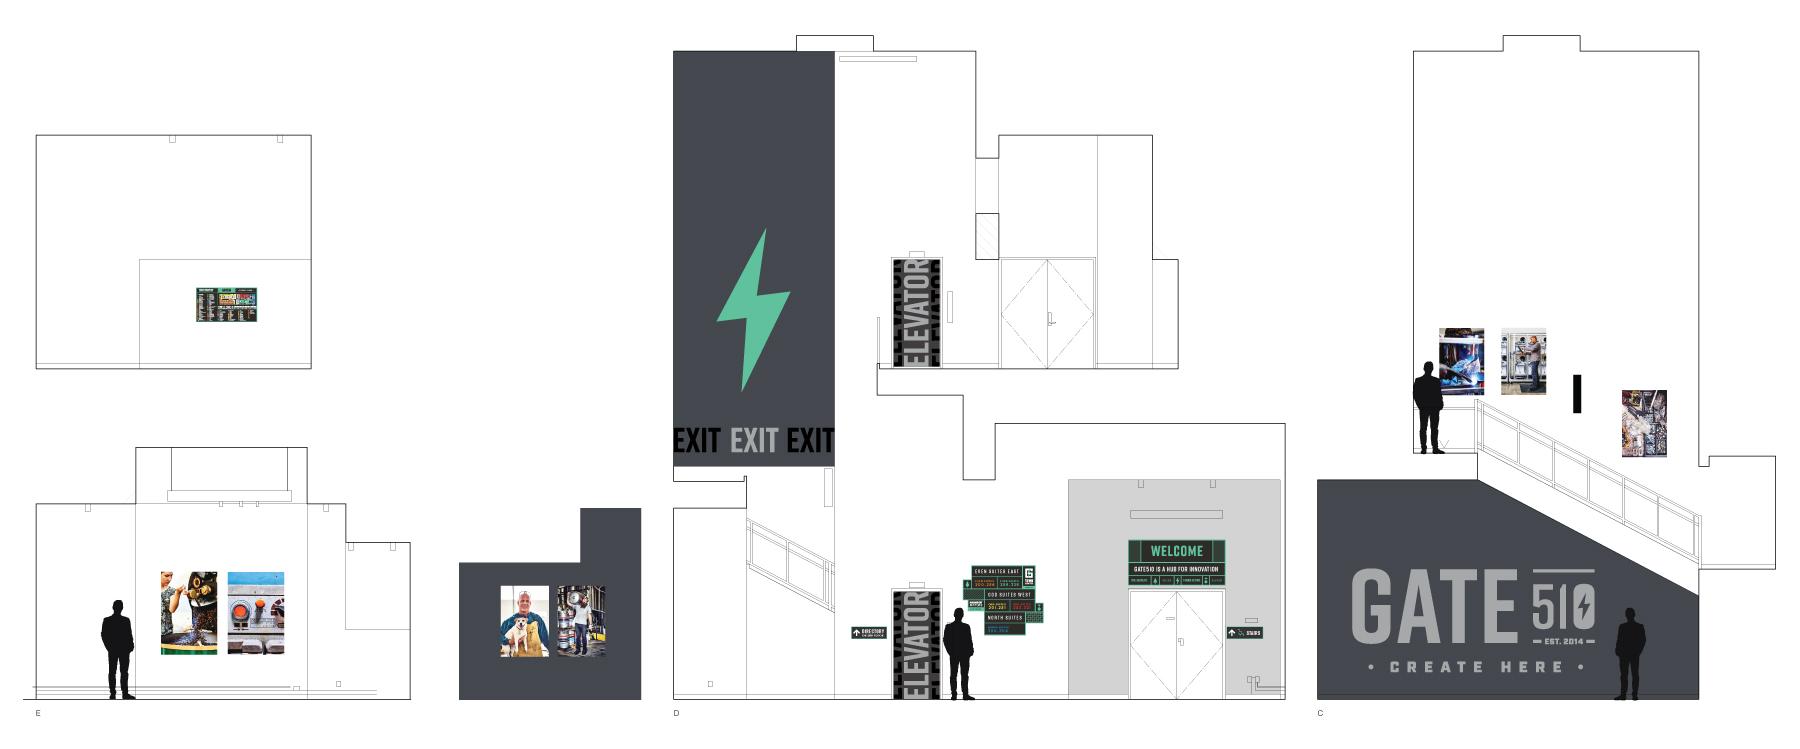 Gate510-lobby-concept.jpg